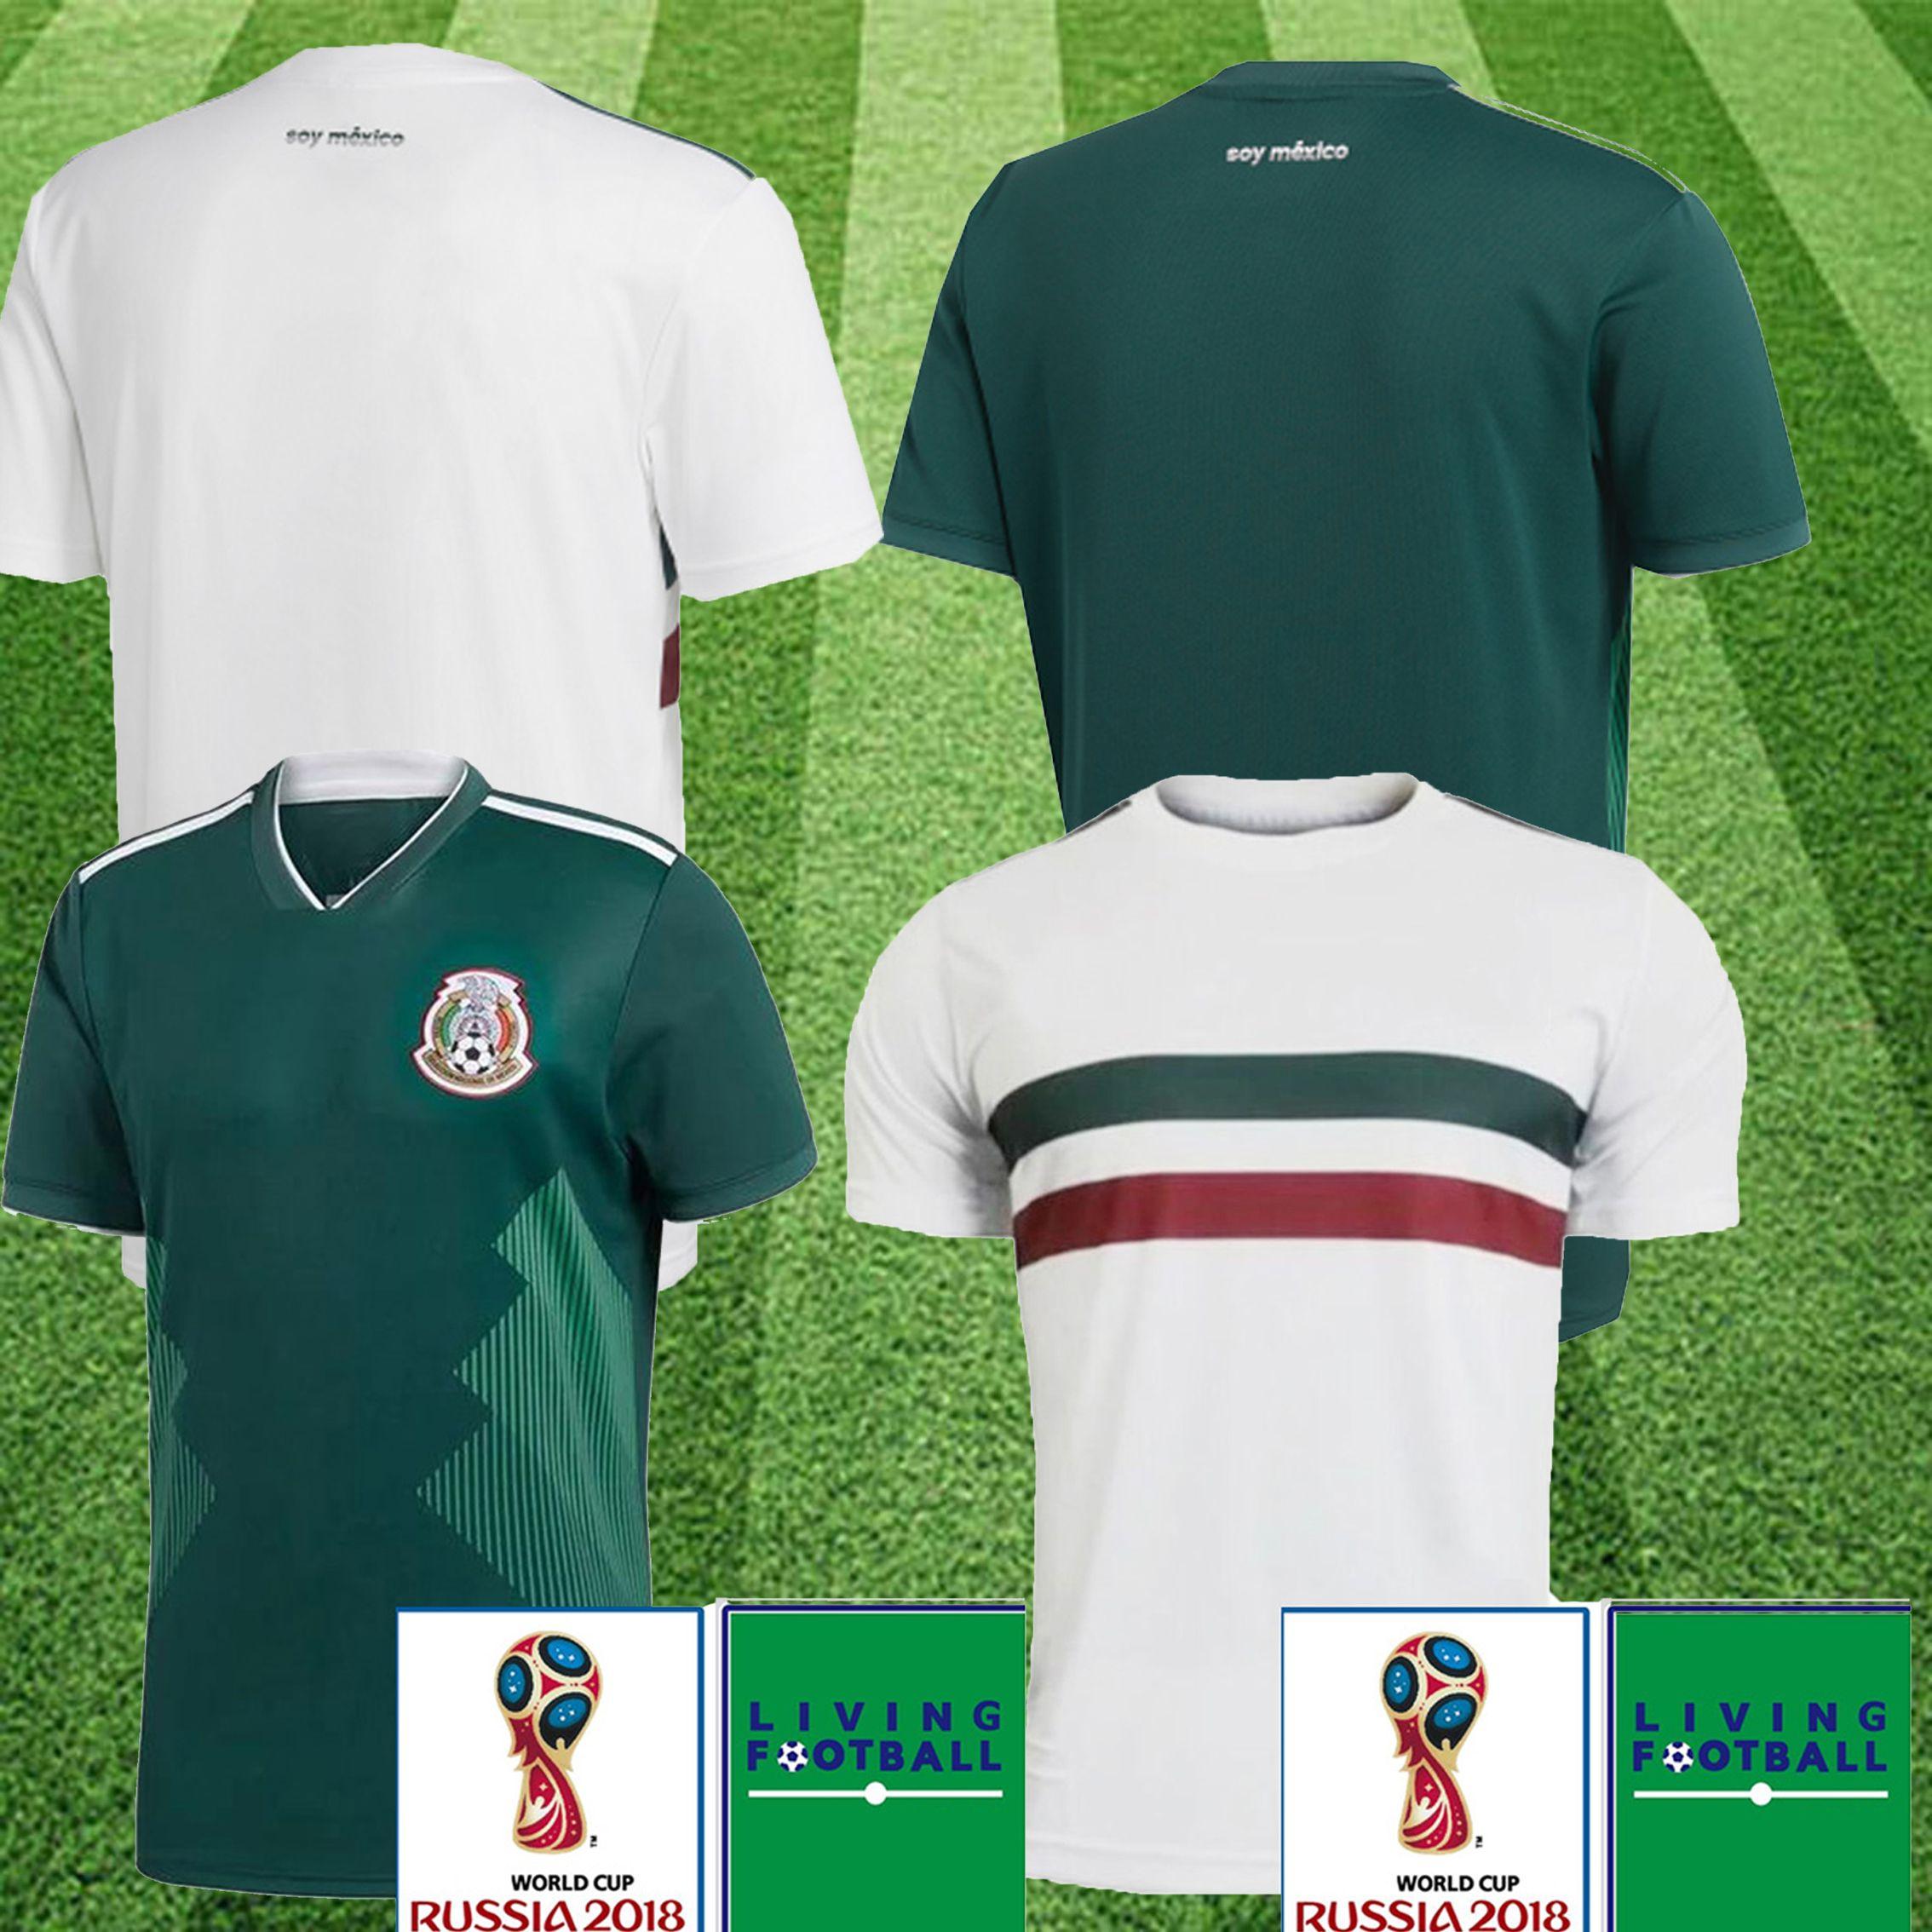 cd1657f5f 2019 Thailand Gold Cup Camisetas Mexico MEN WOMEN Soccer Jersey CHICHARITO  LOZANO MARQUEZ DOS SANTOS Girl Football Shirt Camisa De Futbol From  Lks_wzx, ...